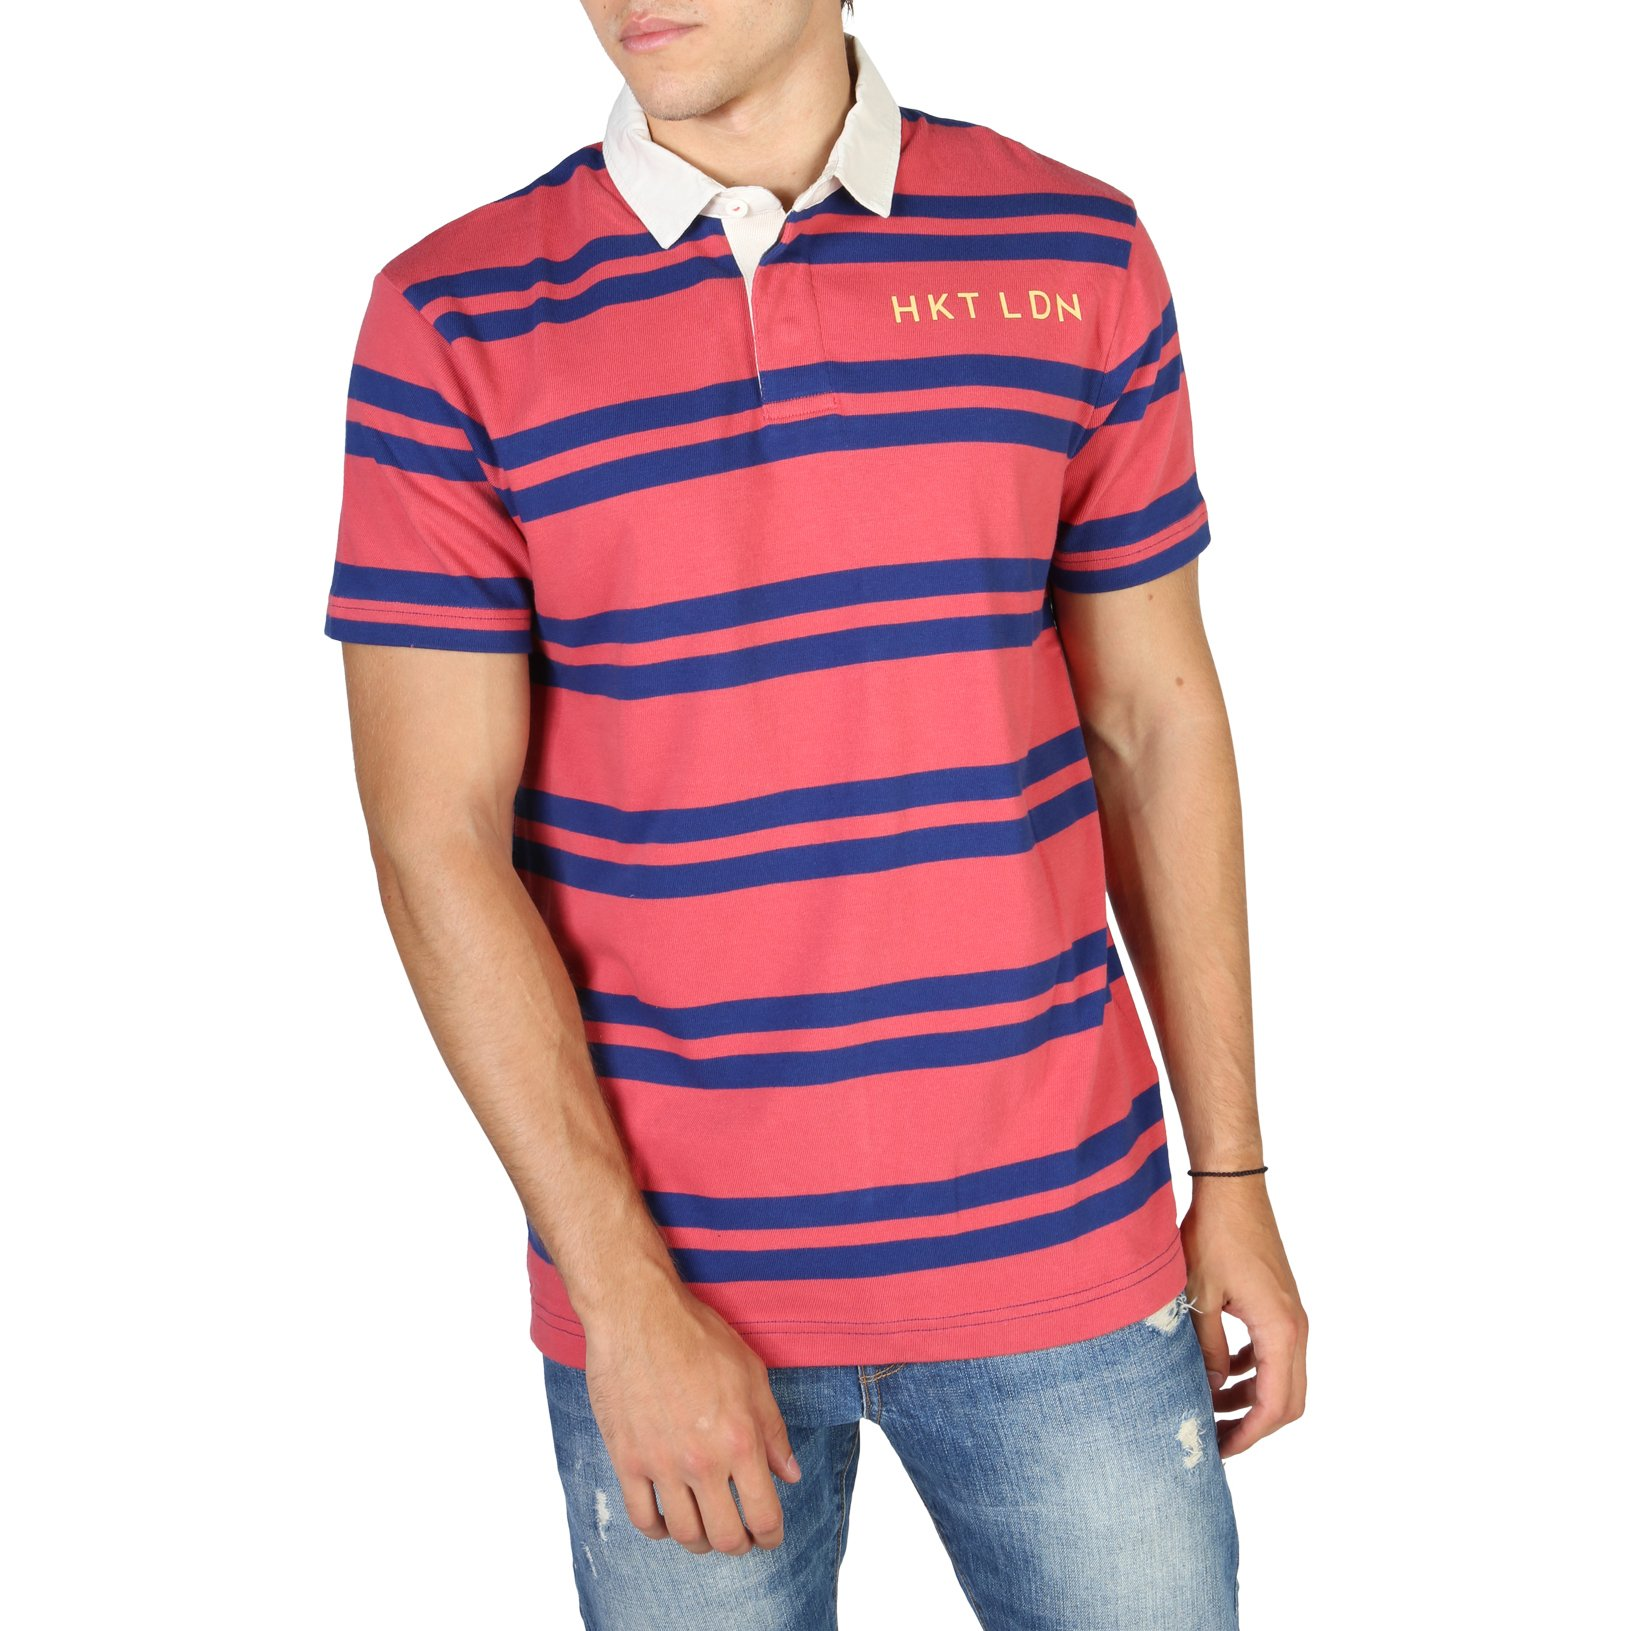 Hackett Men's Polo Shirt Various Colours HM570732 - red M